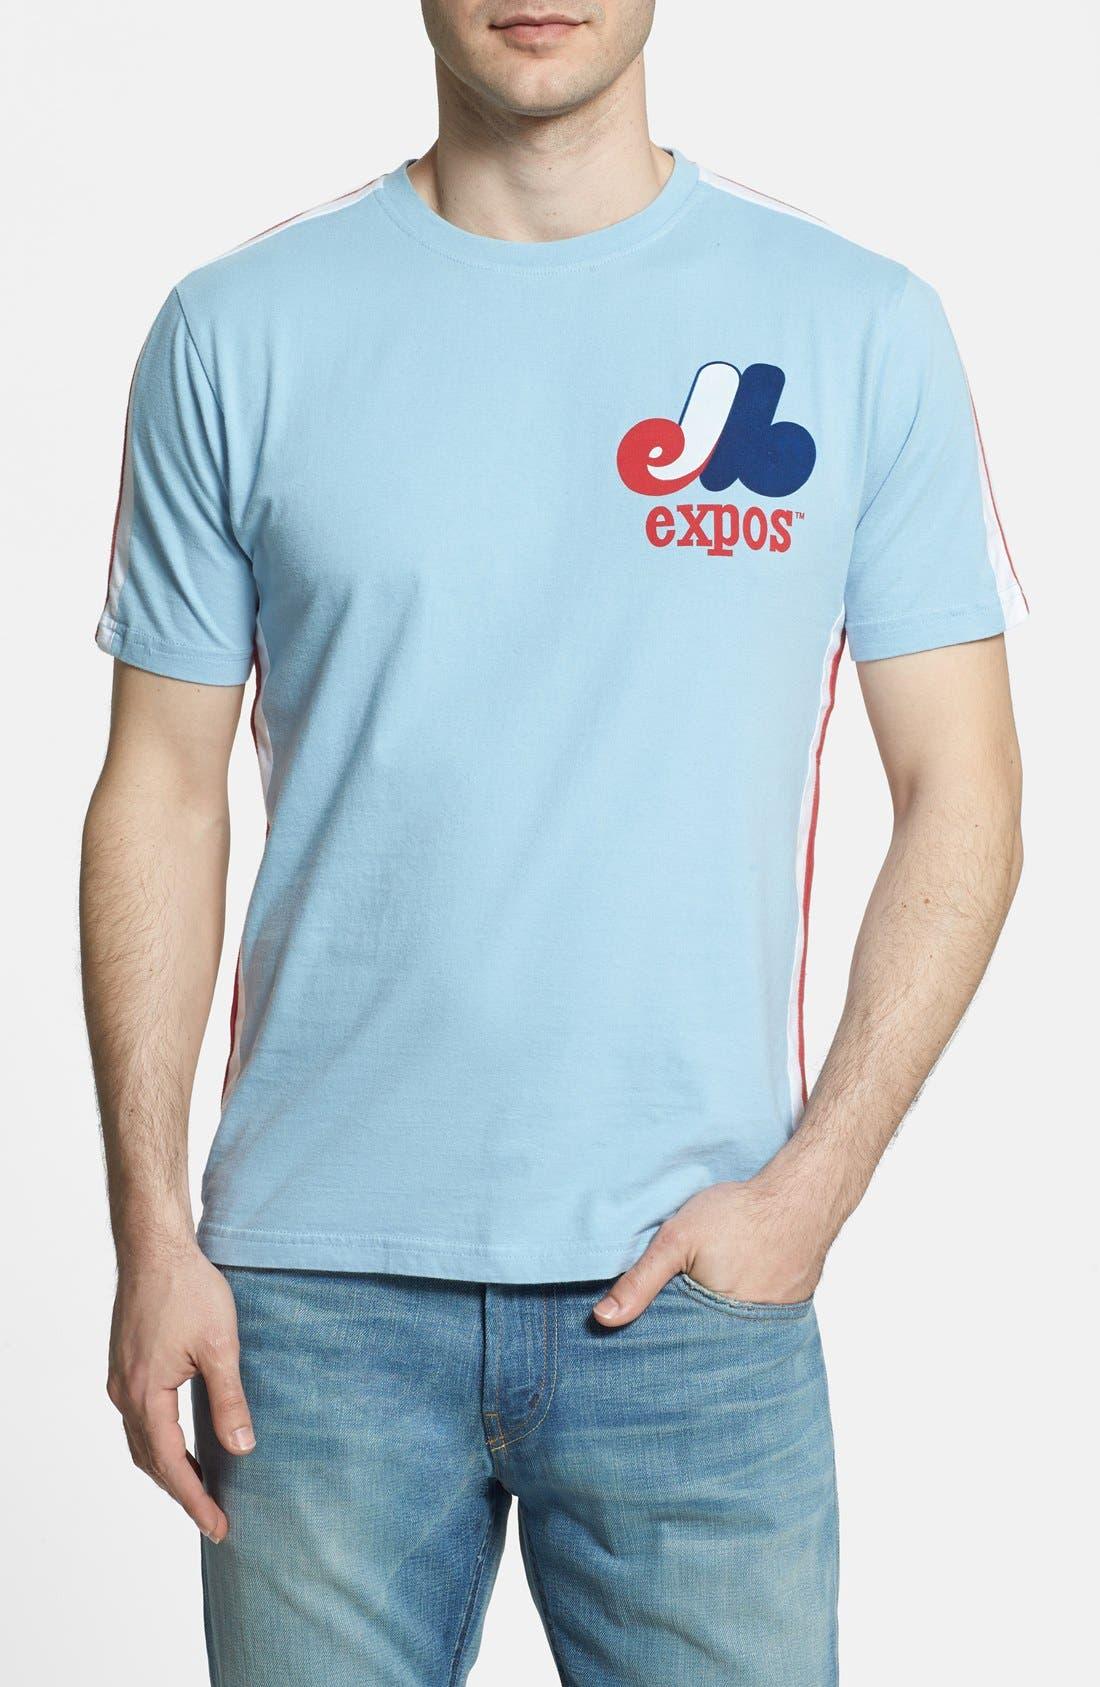 Main Image - Red Jacket 'Expos - Remote Control' T-Shirt (Men)